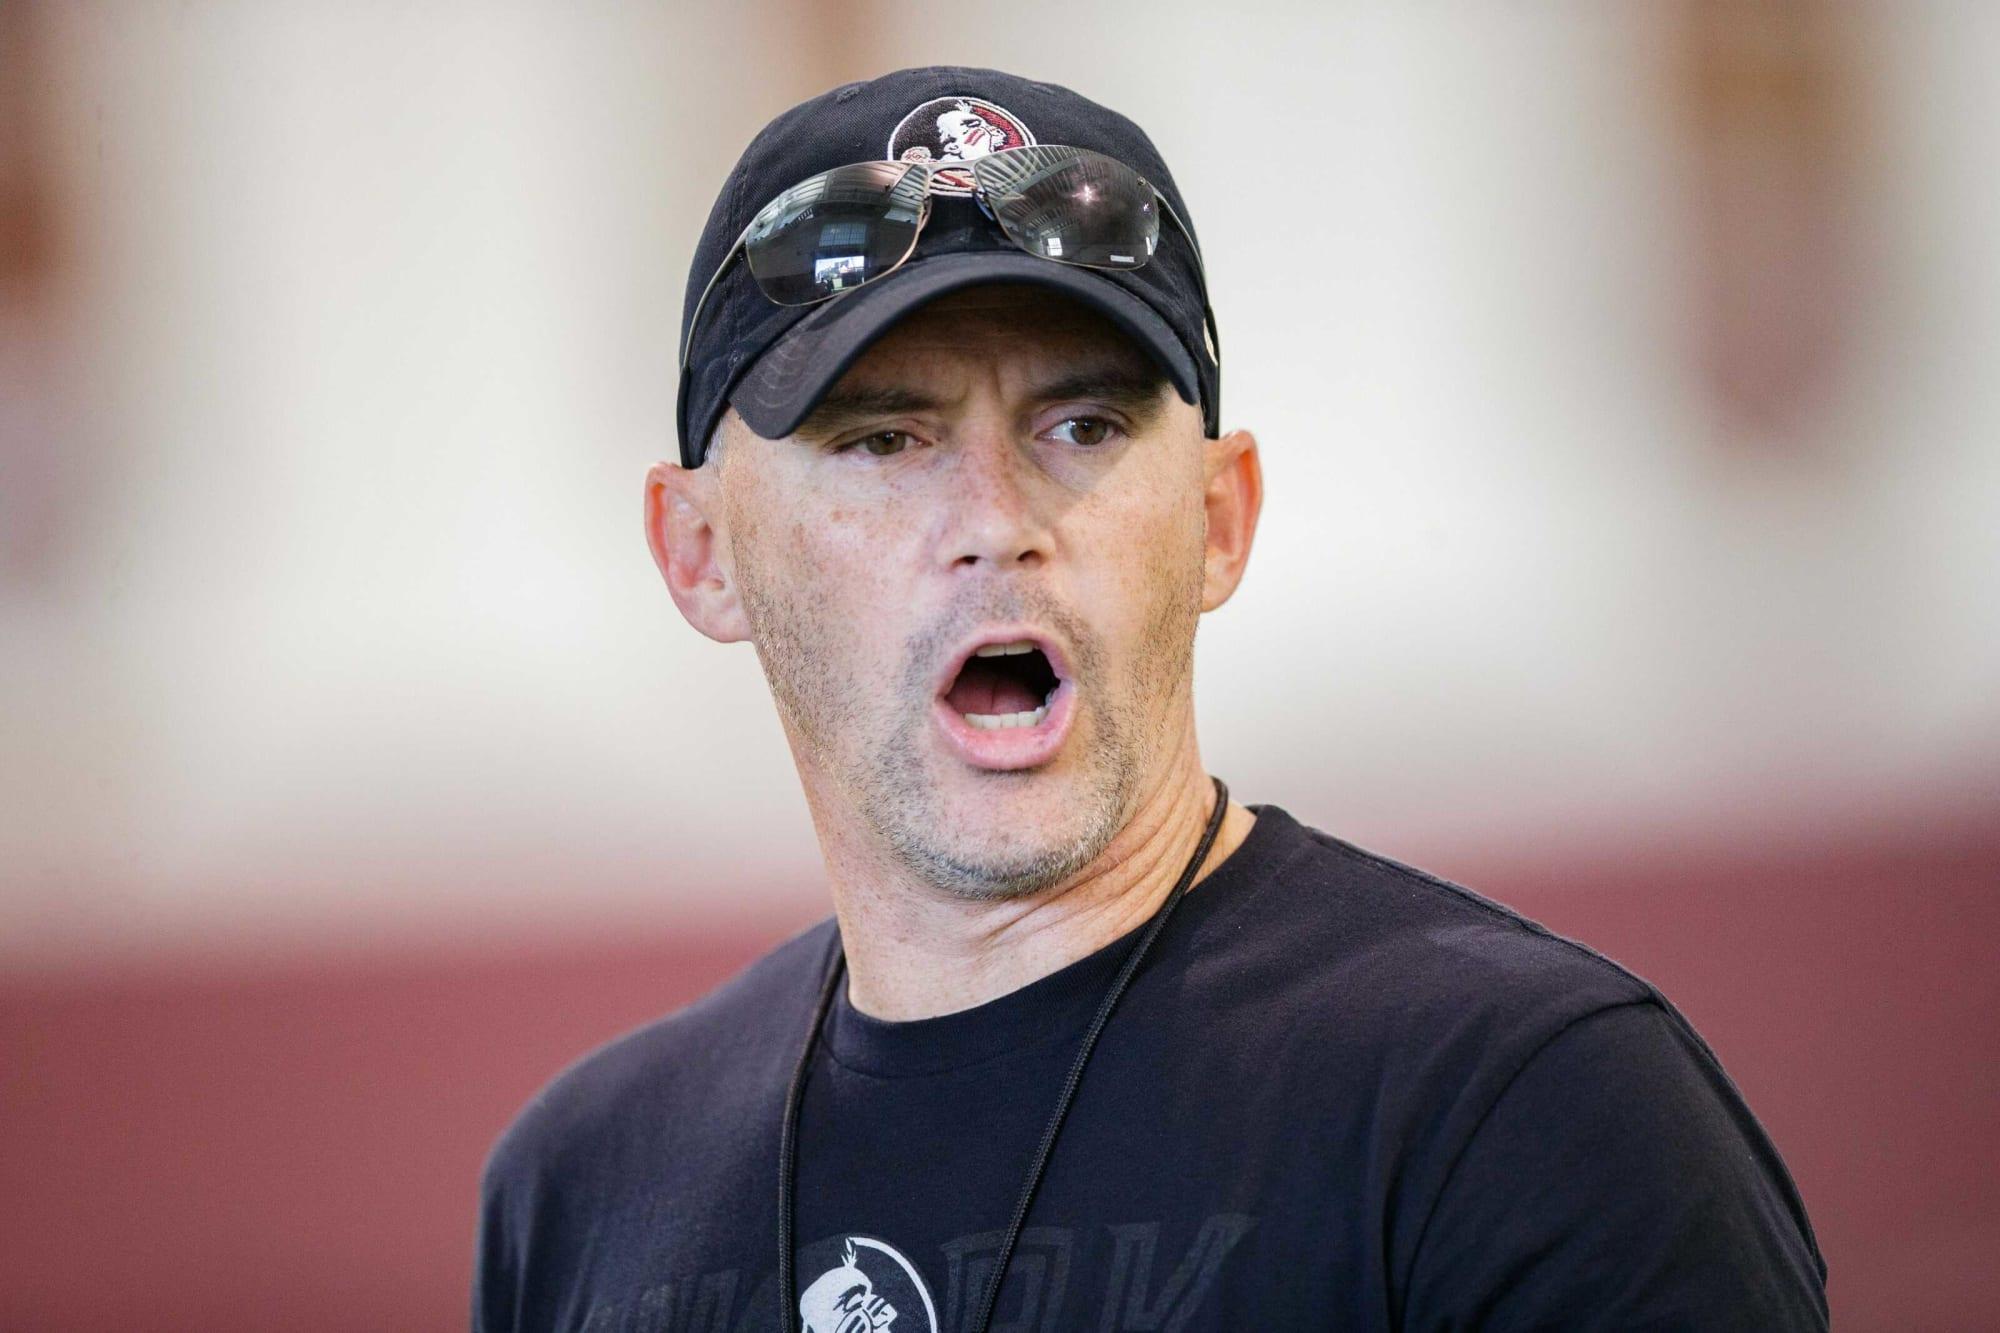 Twitter critica a Mike Norvell por errores de entrenador durante el partido de Notre Dame